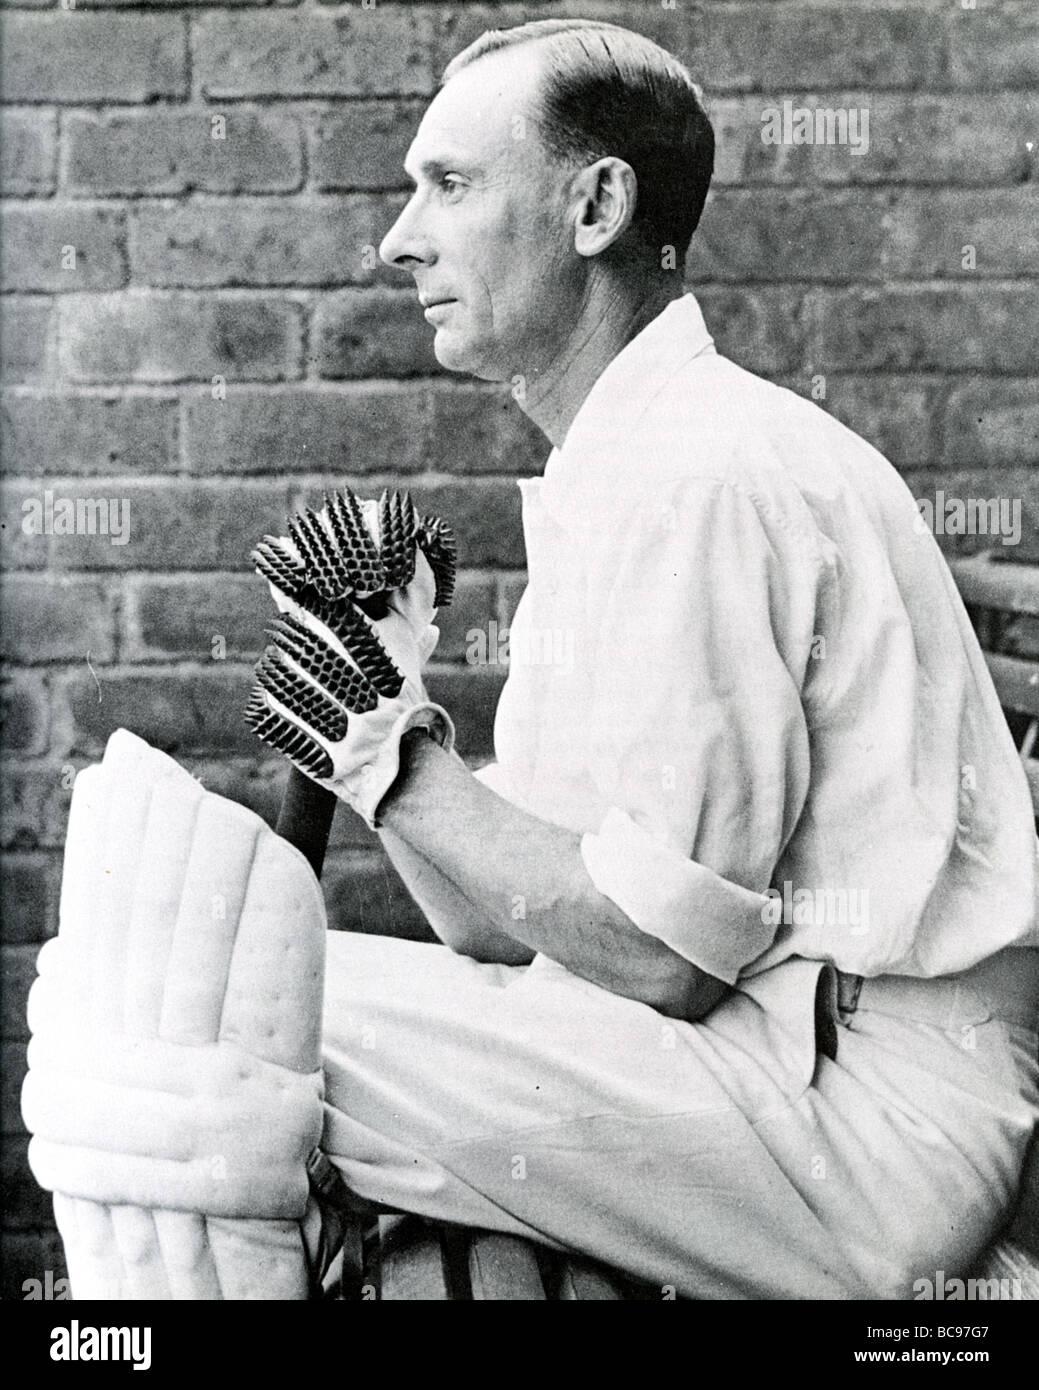 JACK HOBBS - English Test cricketer (1882-1963) - Stock Image